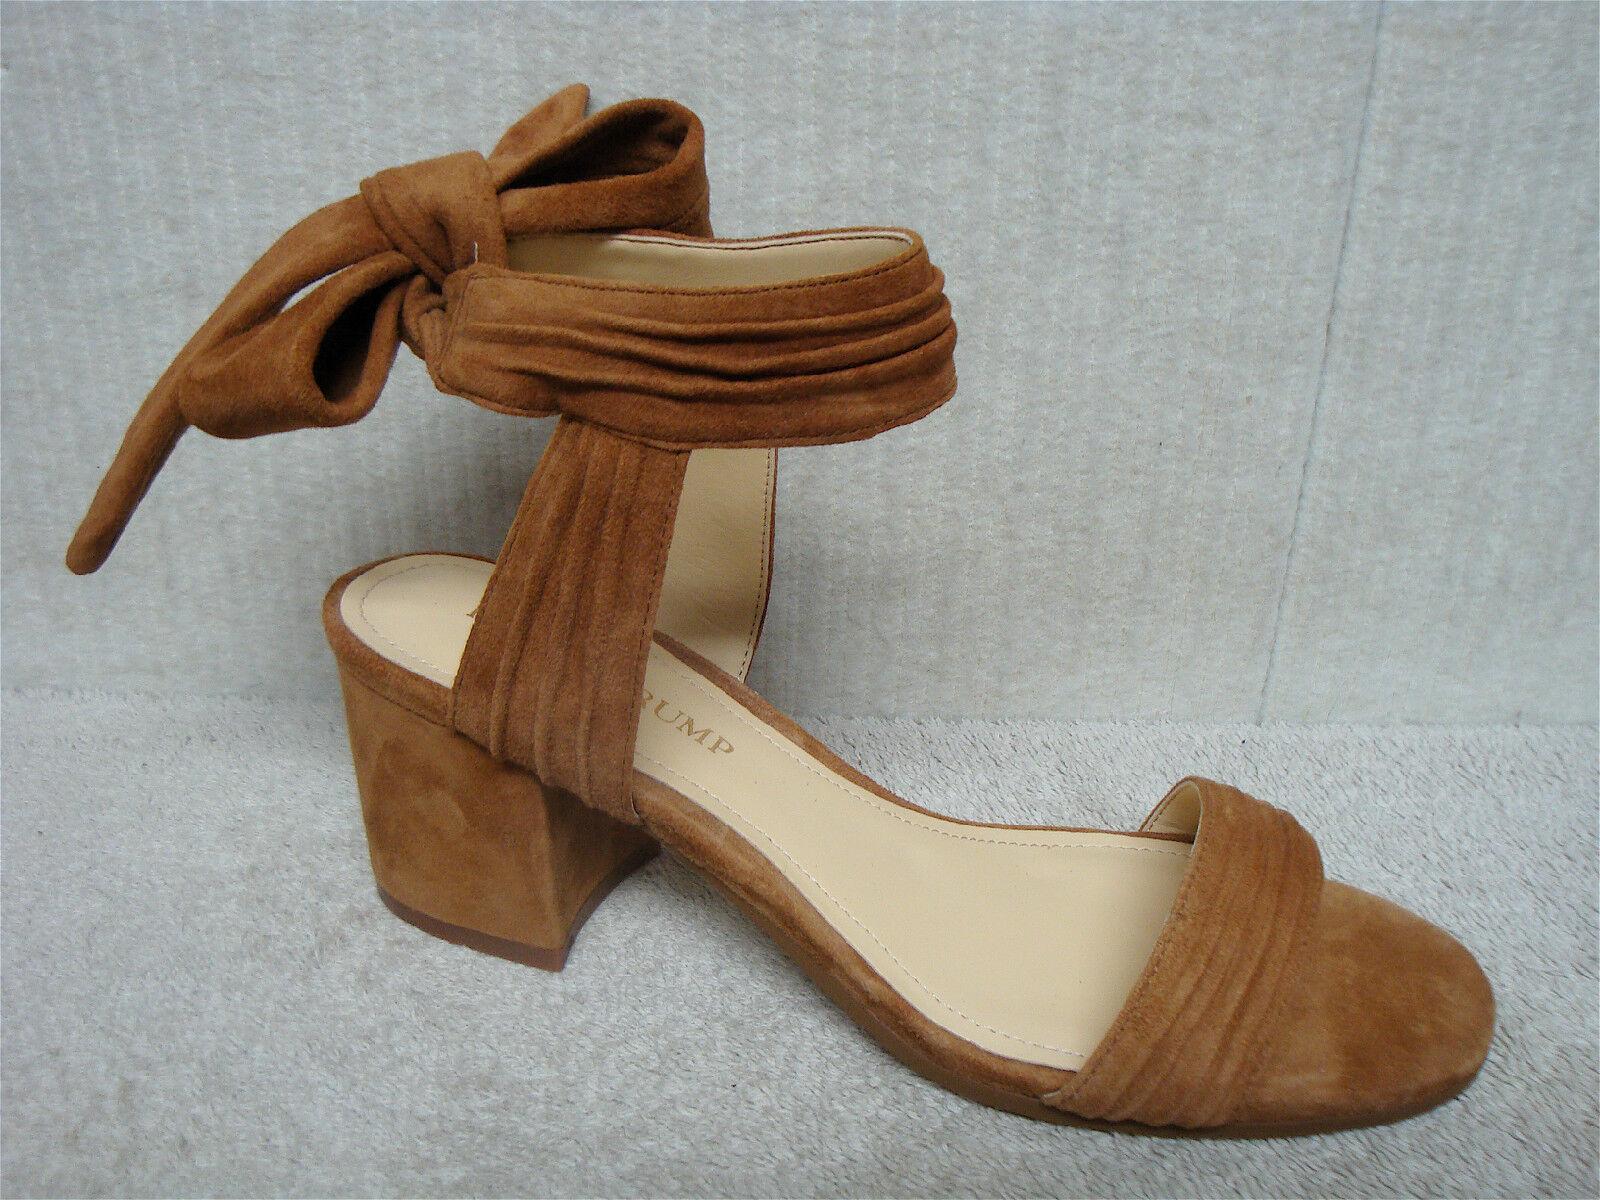 IVANKA TRUMP - EDLINE - Braun Suede Leder Sandale Heels - Größe 8 M